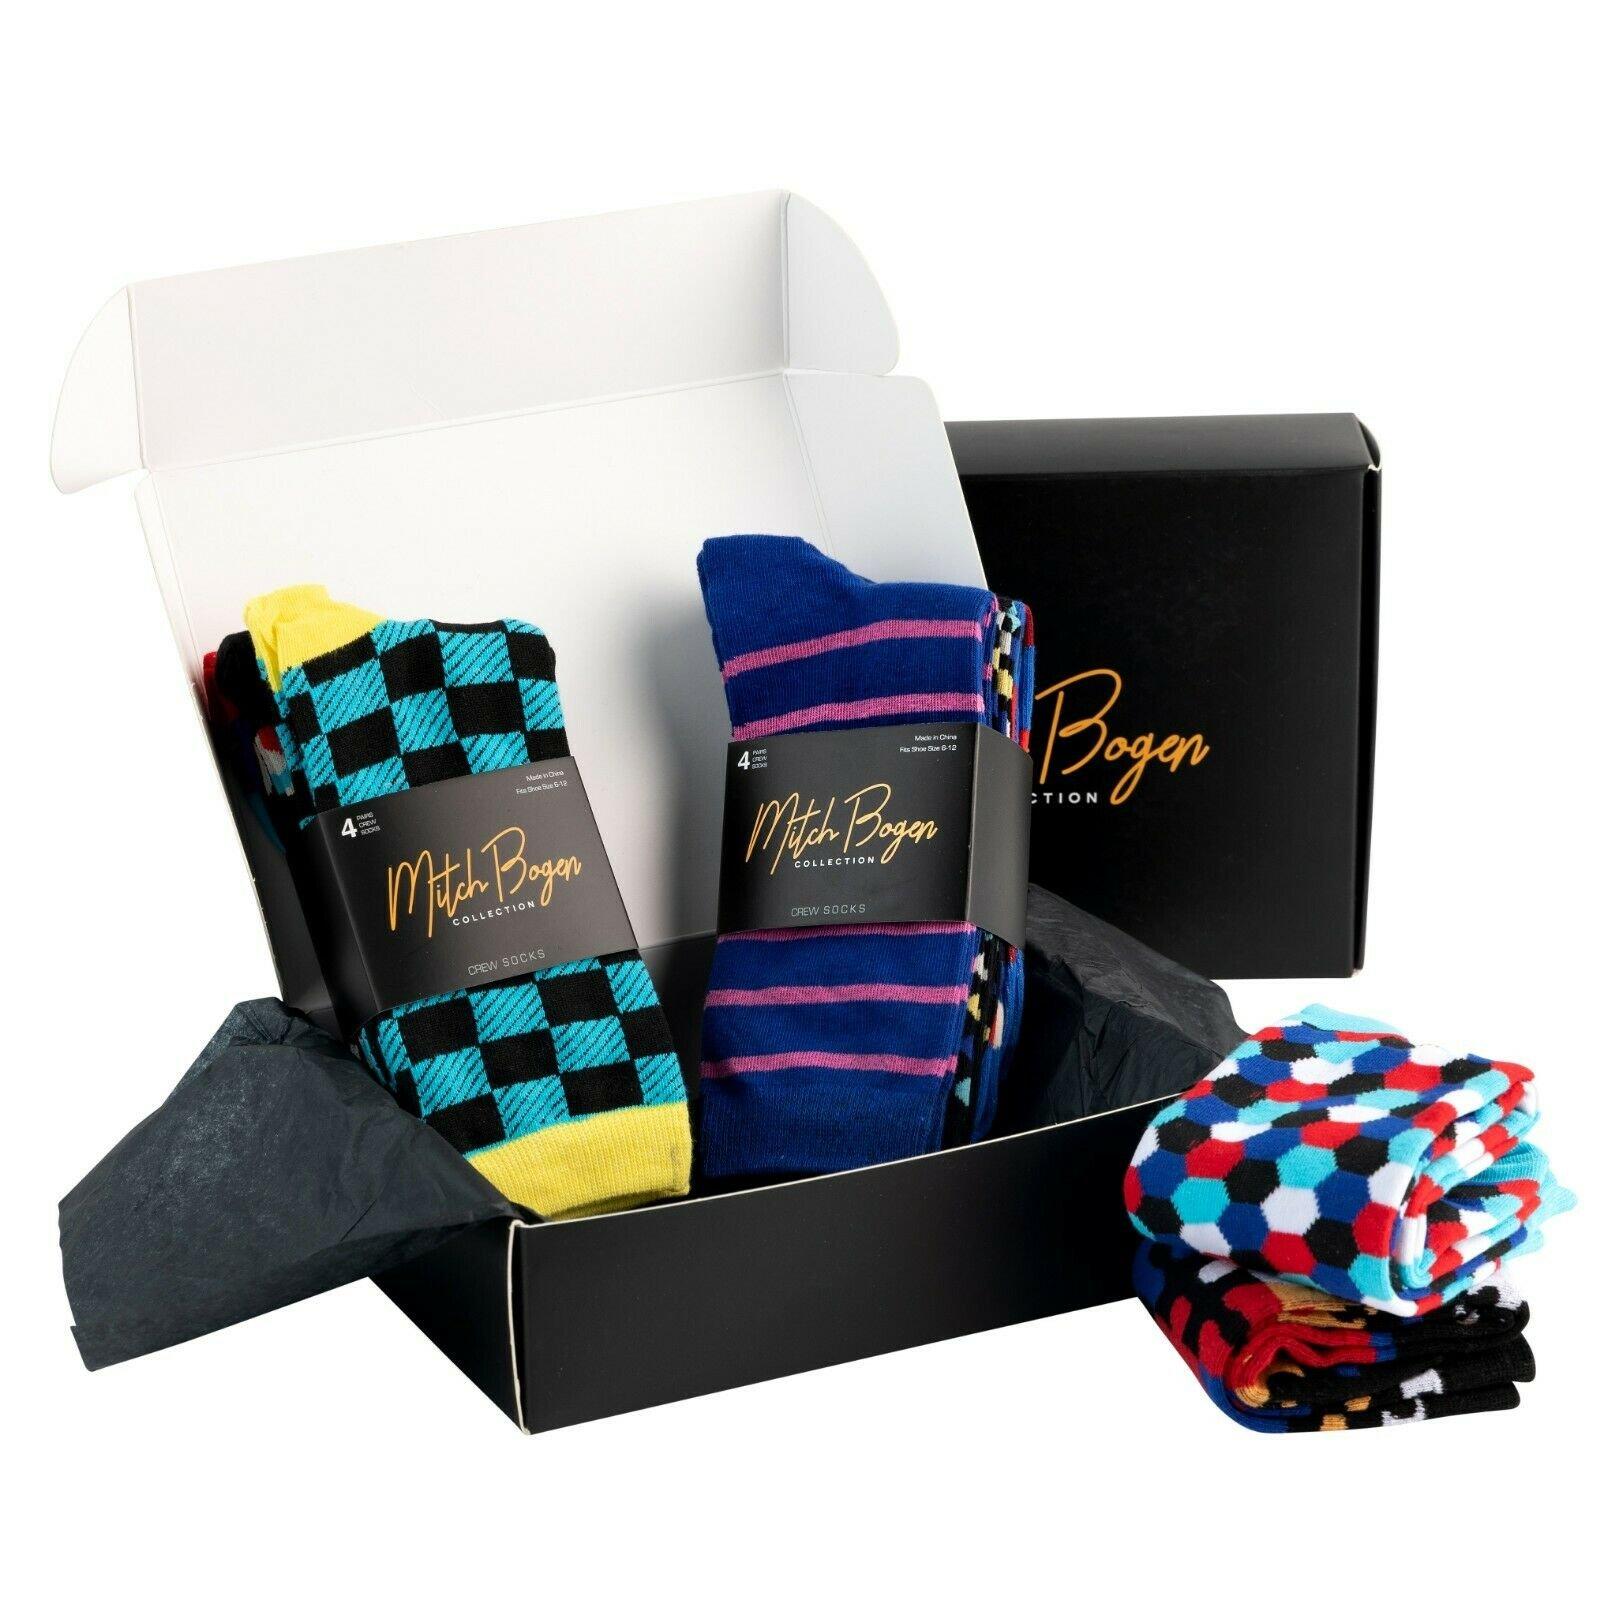 Mitch-Bogen-Mens-Cotton-Dress-Socks-Colorful-Fashion-Crew-Socks-8-Pack-Gift-Box thumbnail 58